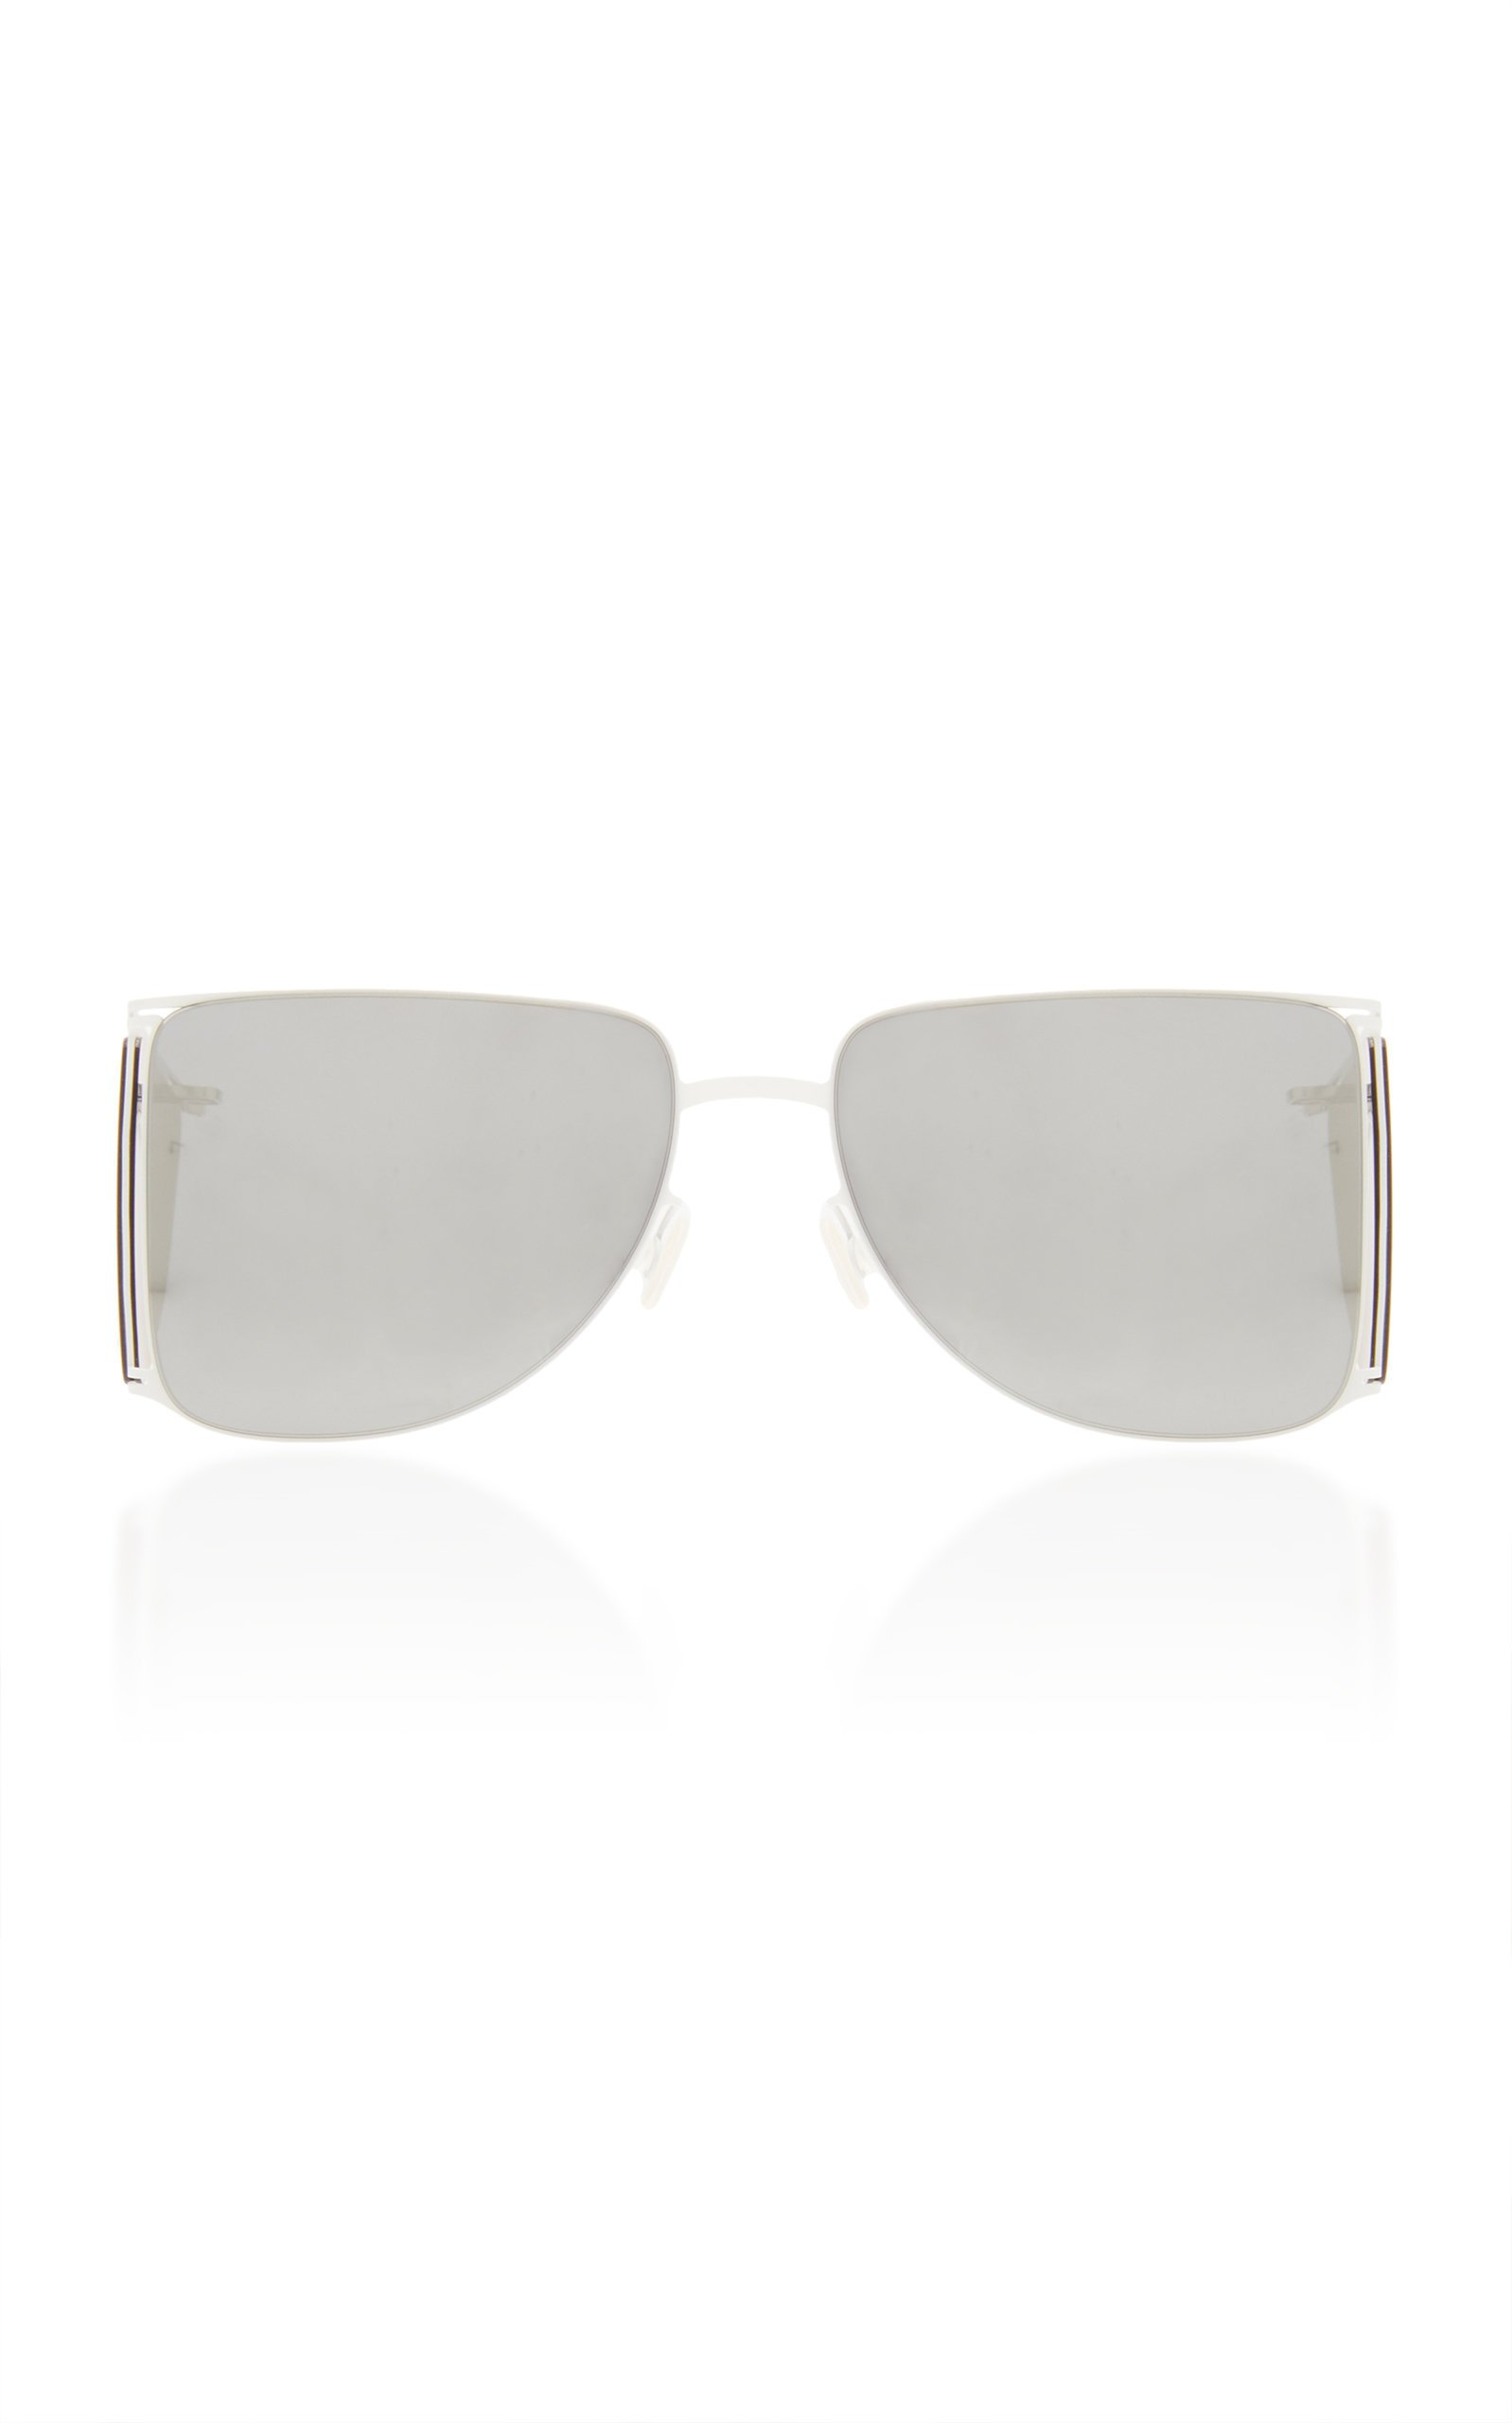 Helmut Lang X MYKITA Aviator-Style Sunglasses